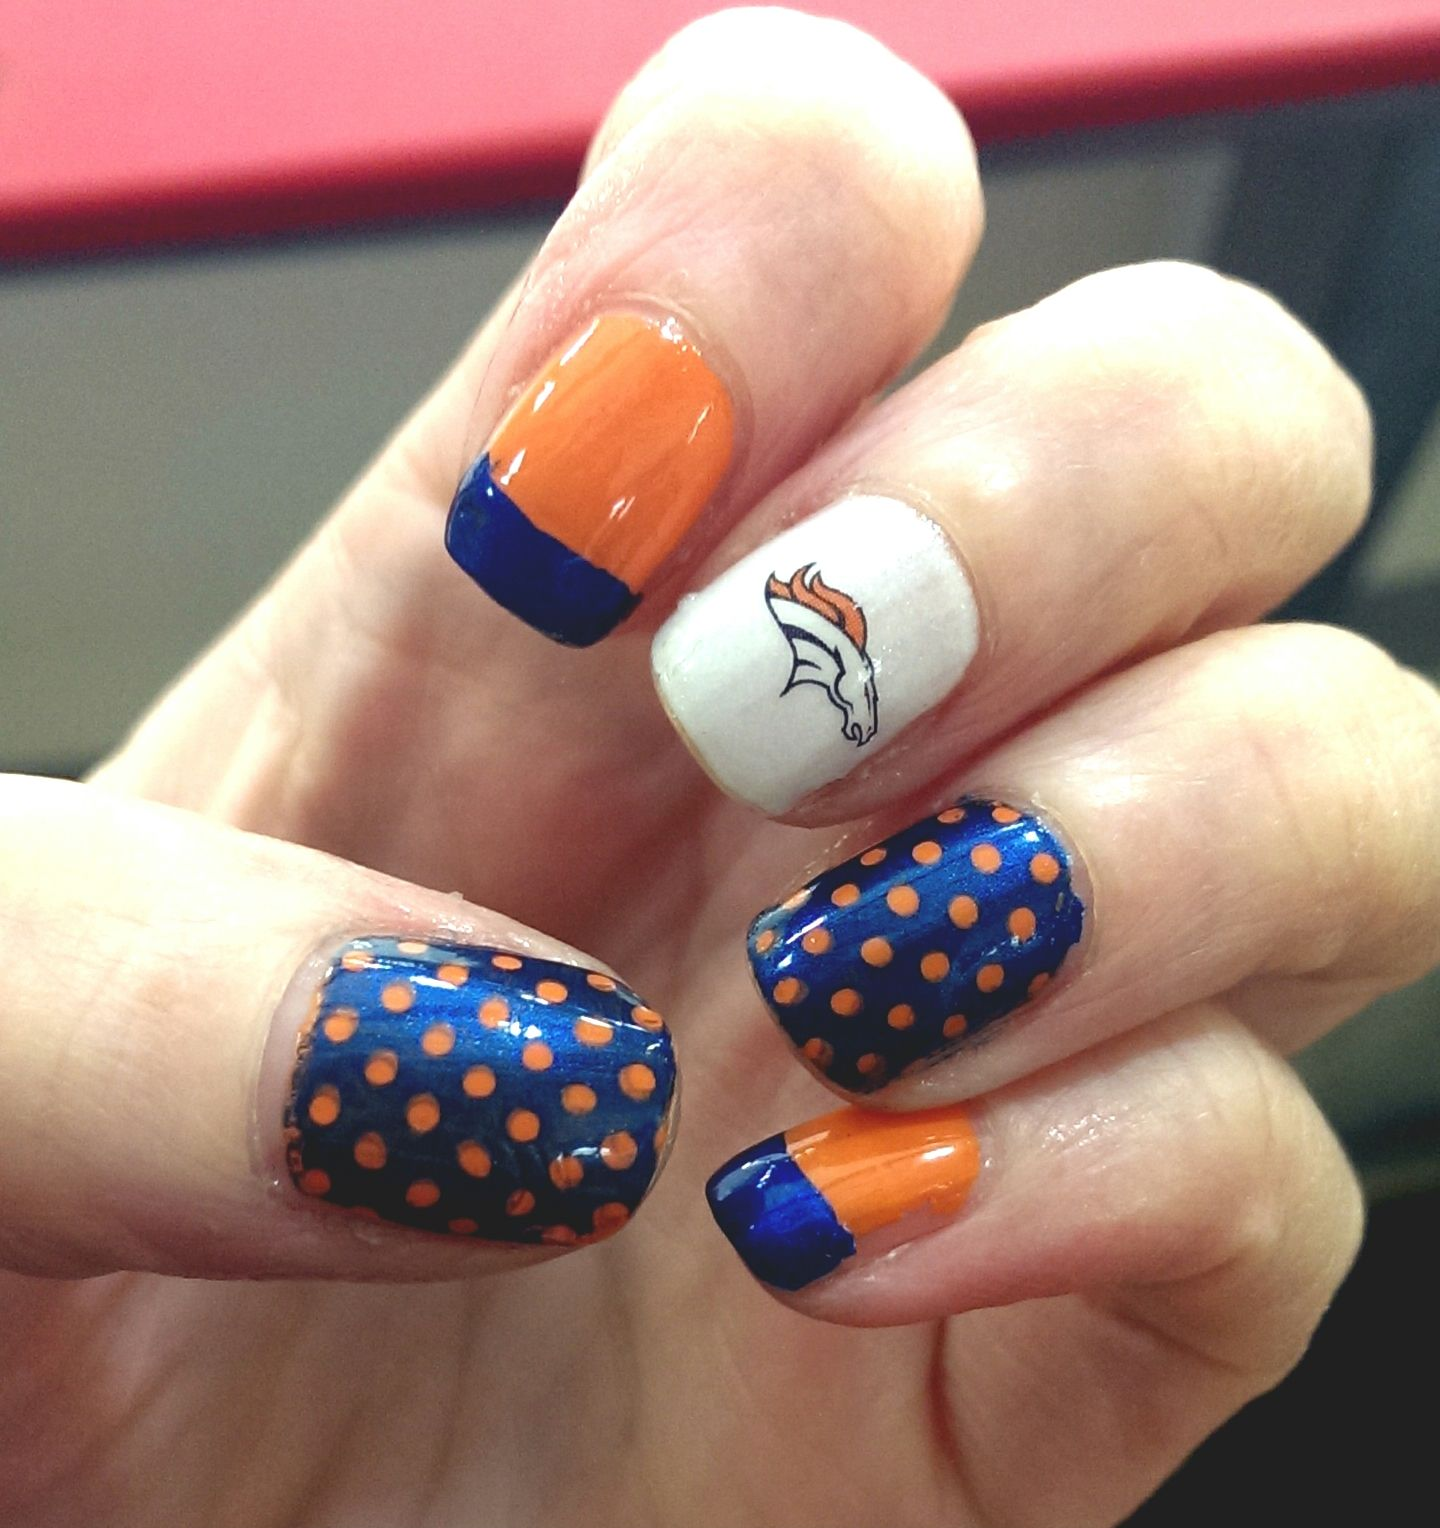 Denver Broncos nail art #superbowl - Denver Broncos Nail Art #superbowl NAILS....NAILS Pinterest